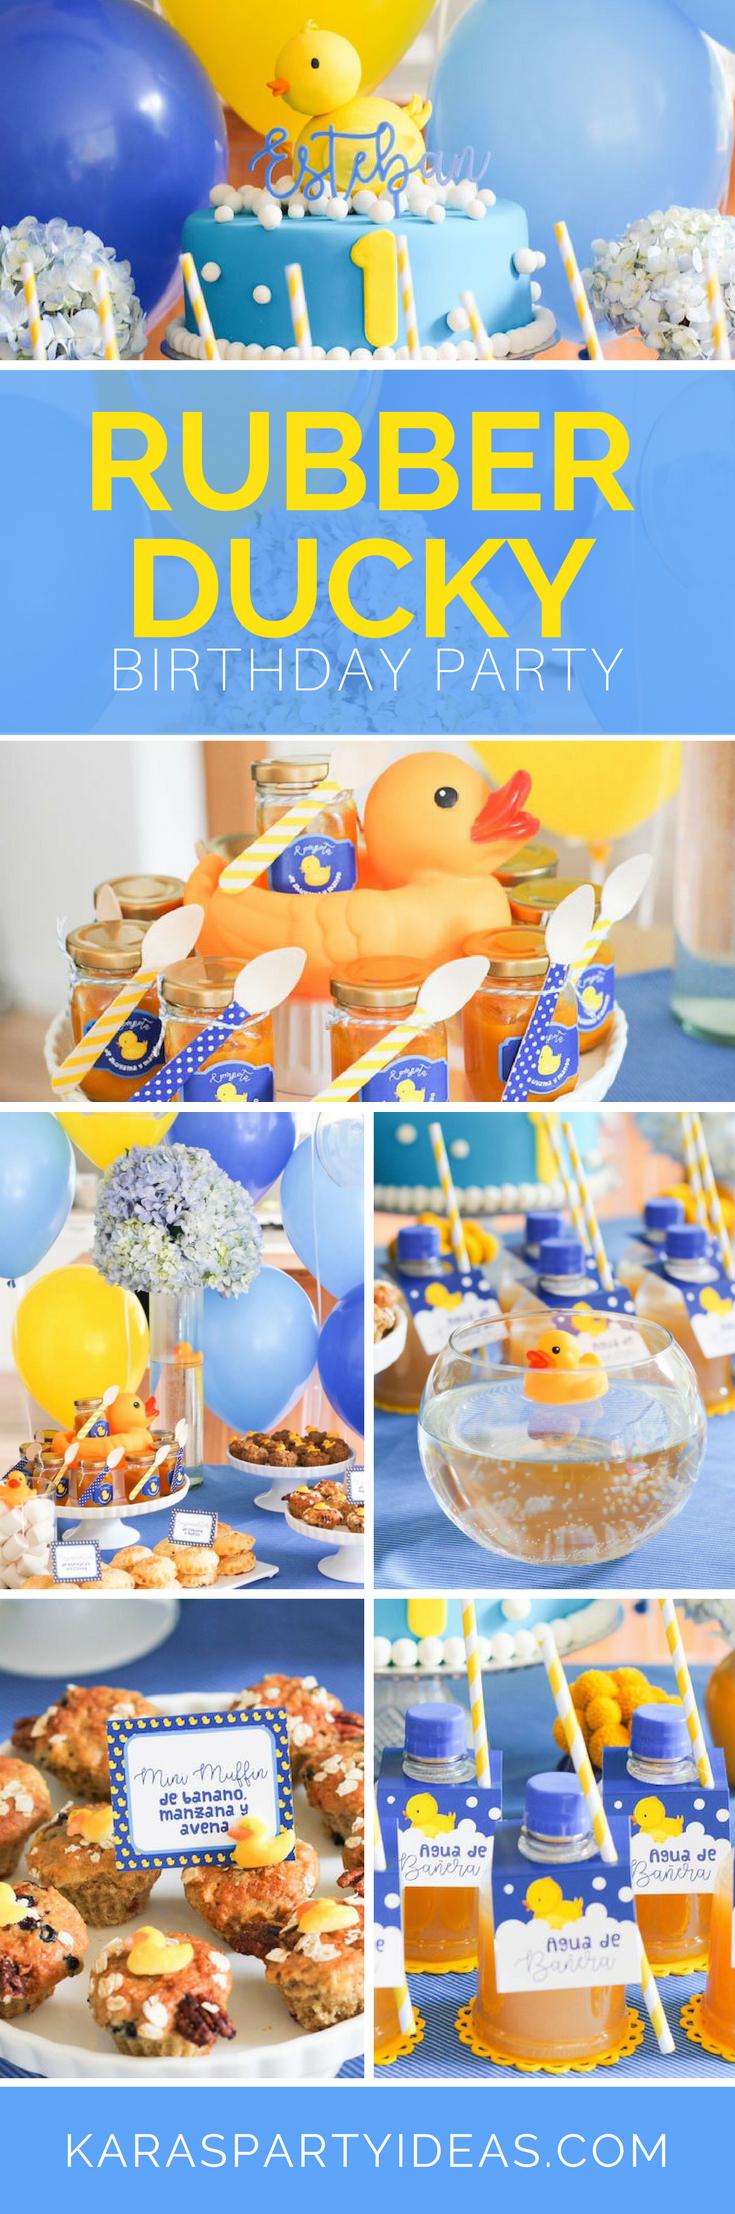 Rubber Ducky Birthday Party via Kara's Party Ideas - KarasPartyIdeas.com